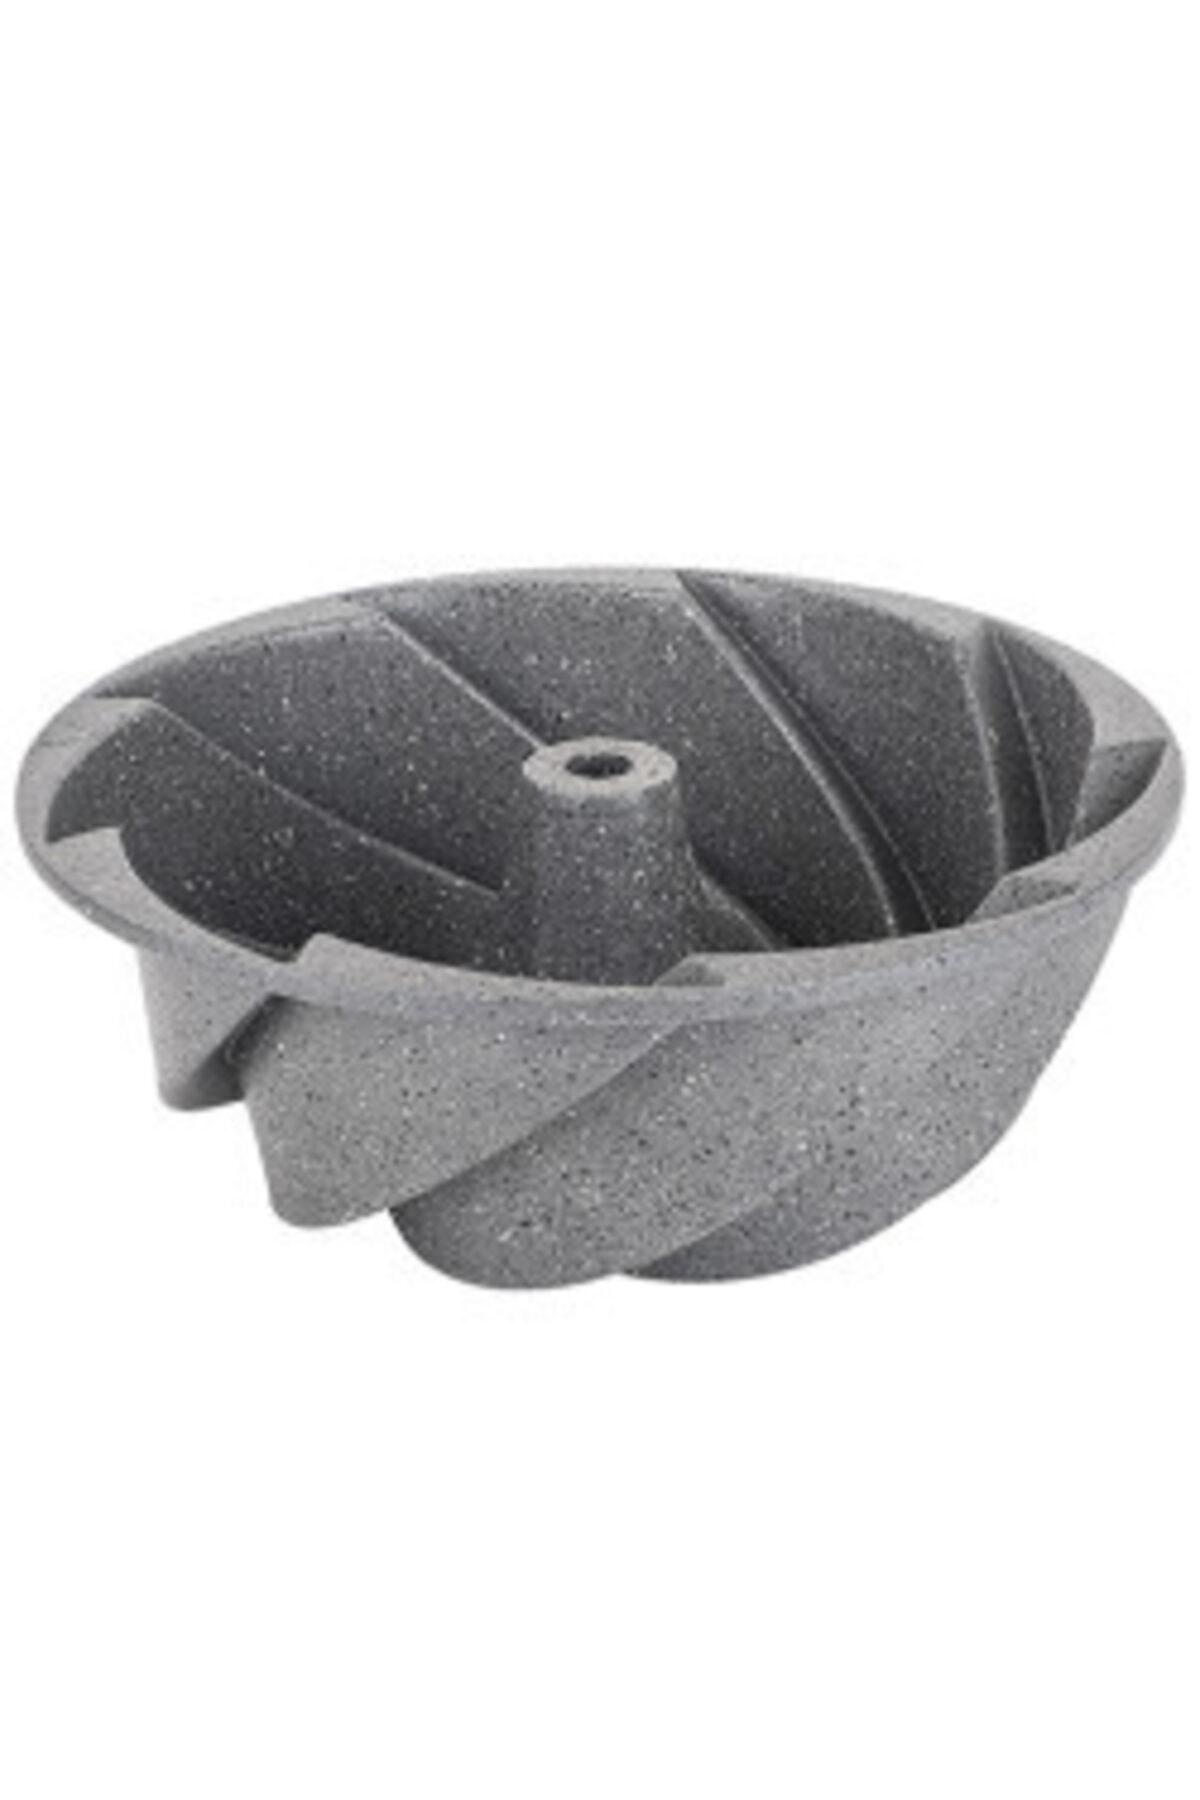 Tantitoni Gri Rüzgar Gülü Granit Döküm Kek Kalıbı 1